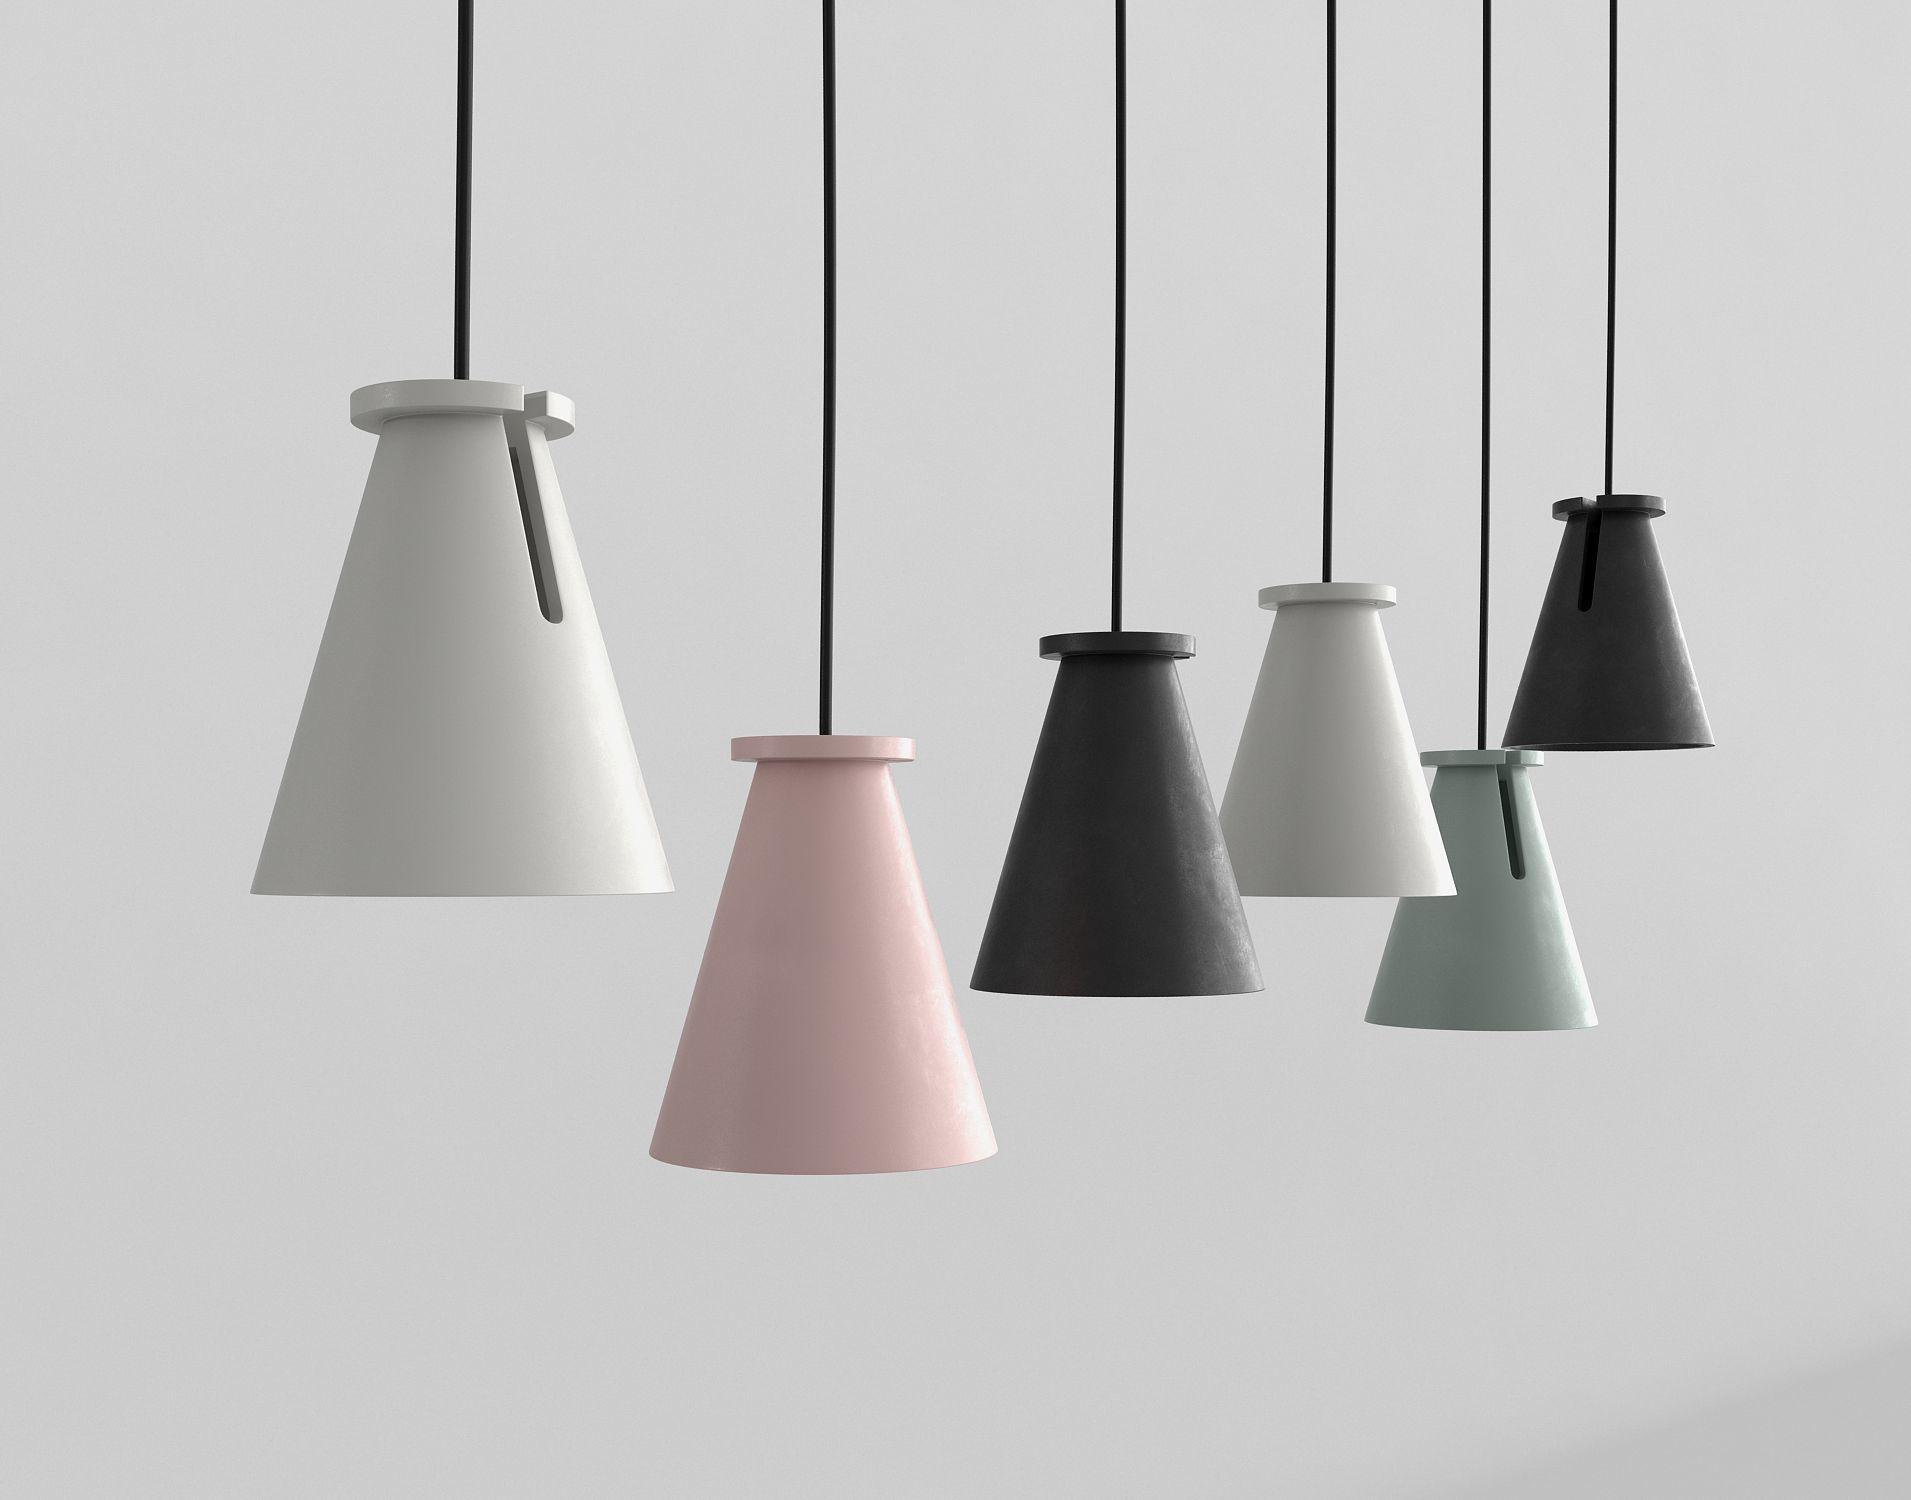 Hanging Lights Minimal Lamps Model